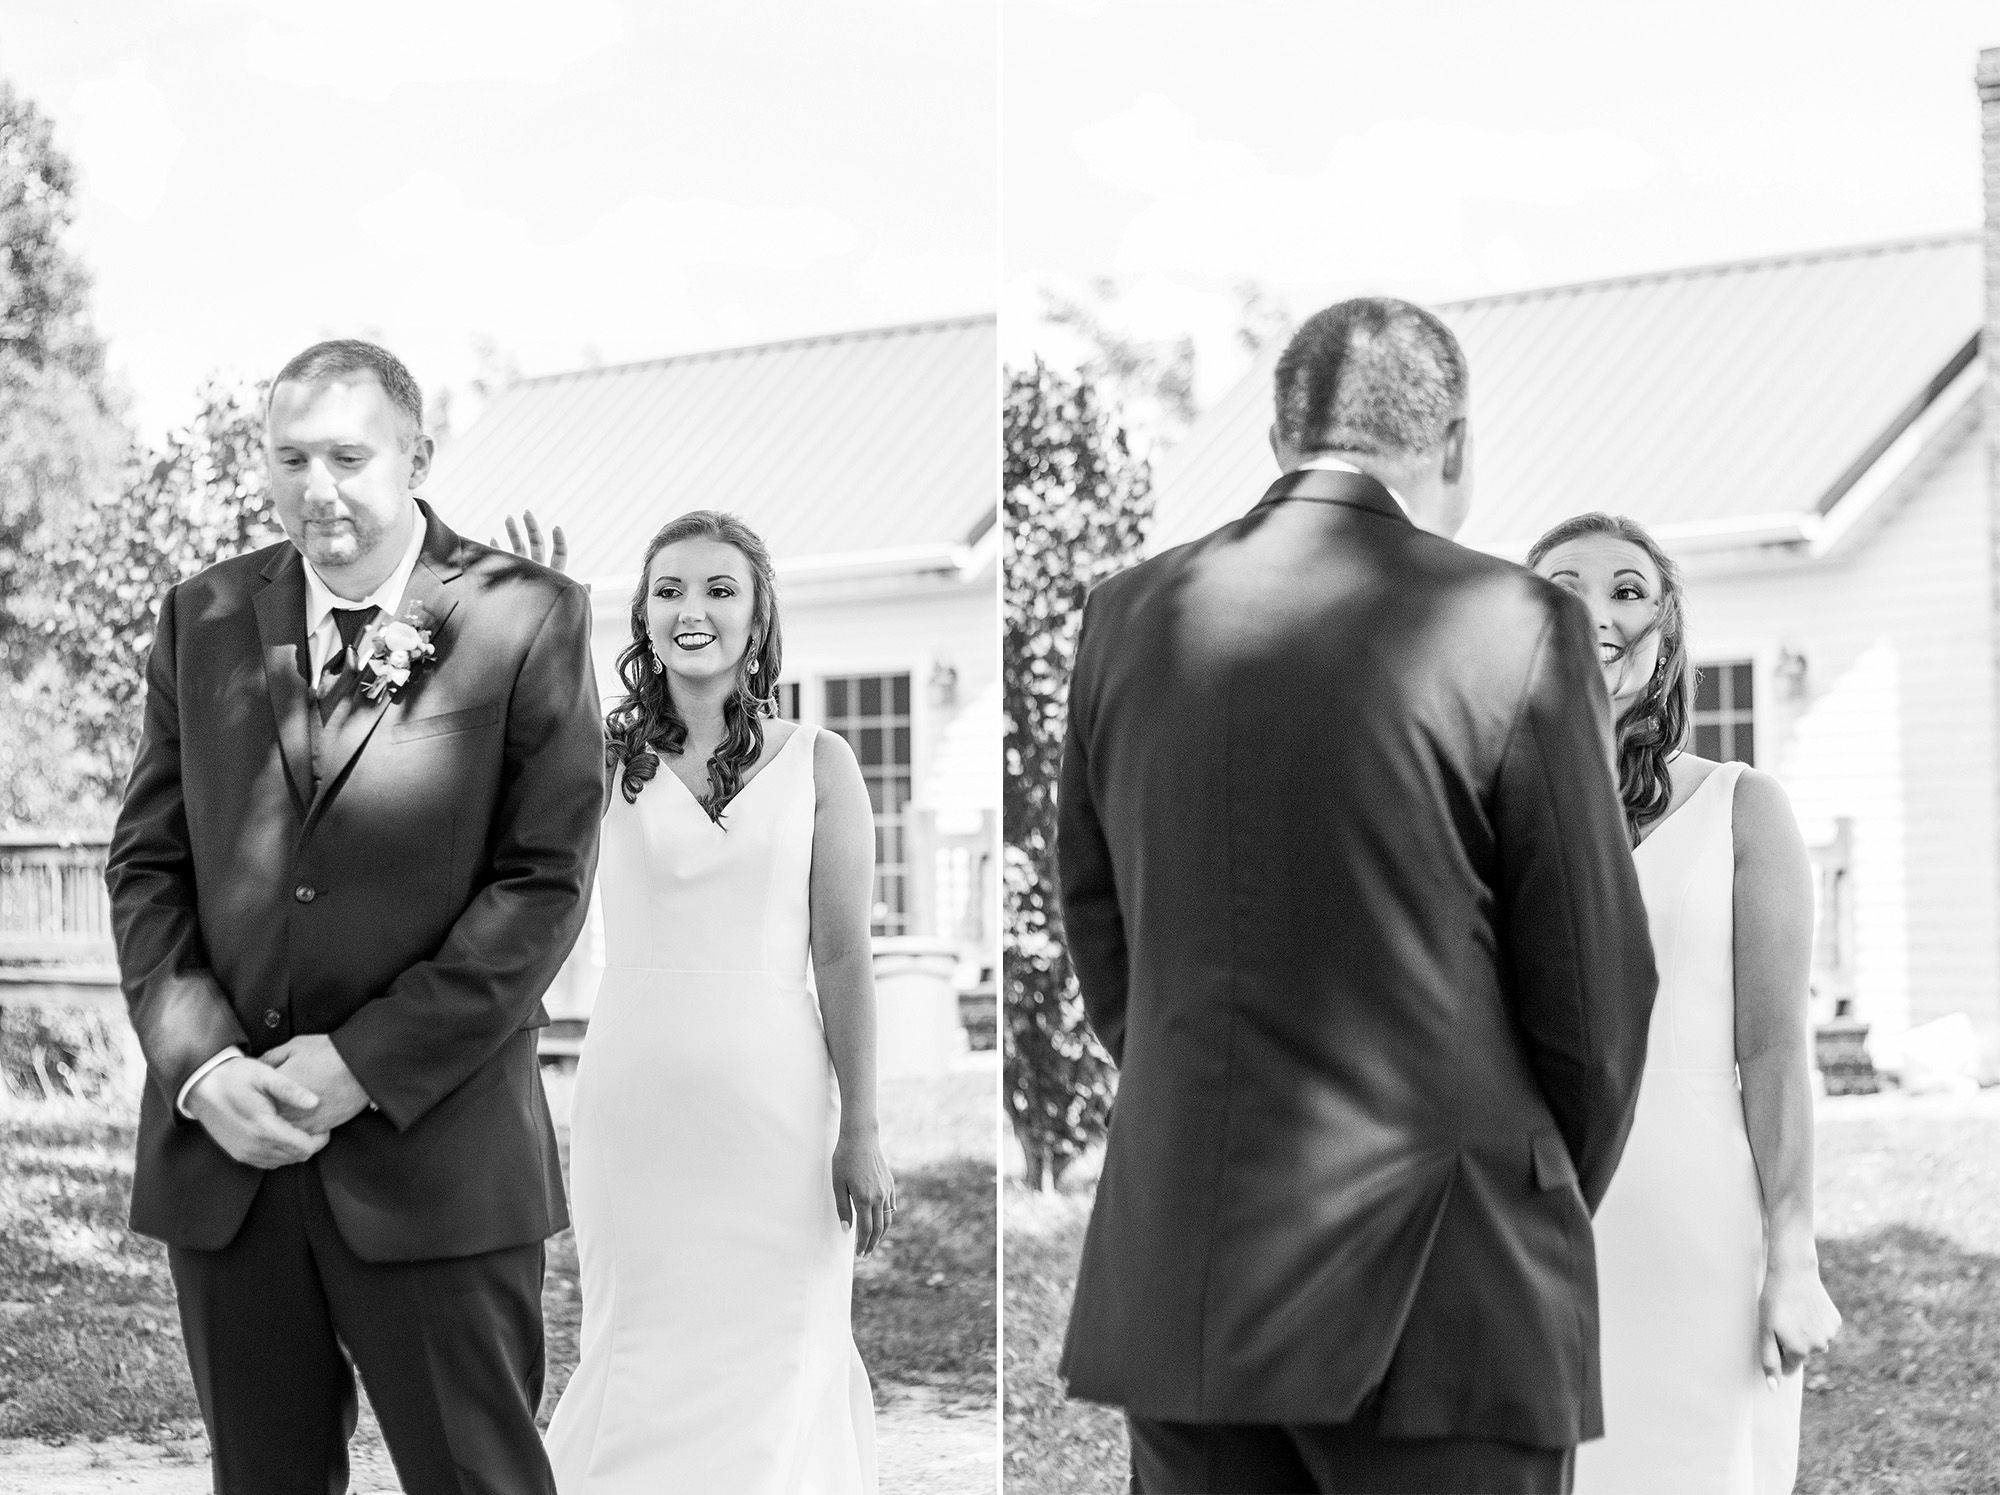 Seriously_Sabrina_Photography_Red_River_Gorge_Wedding_Barn_Robinson30.jpg